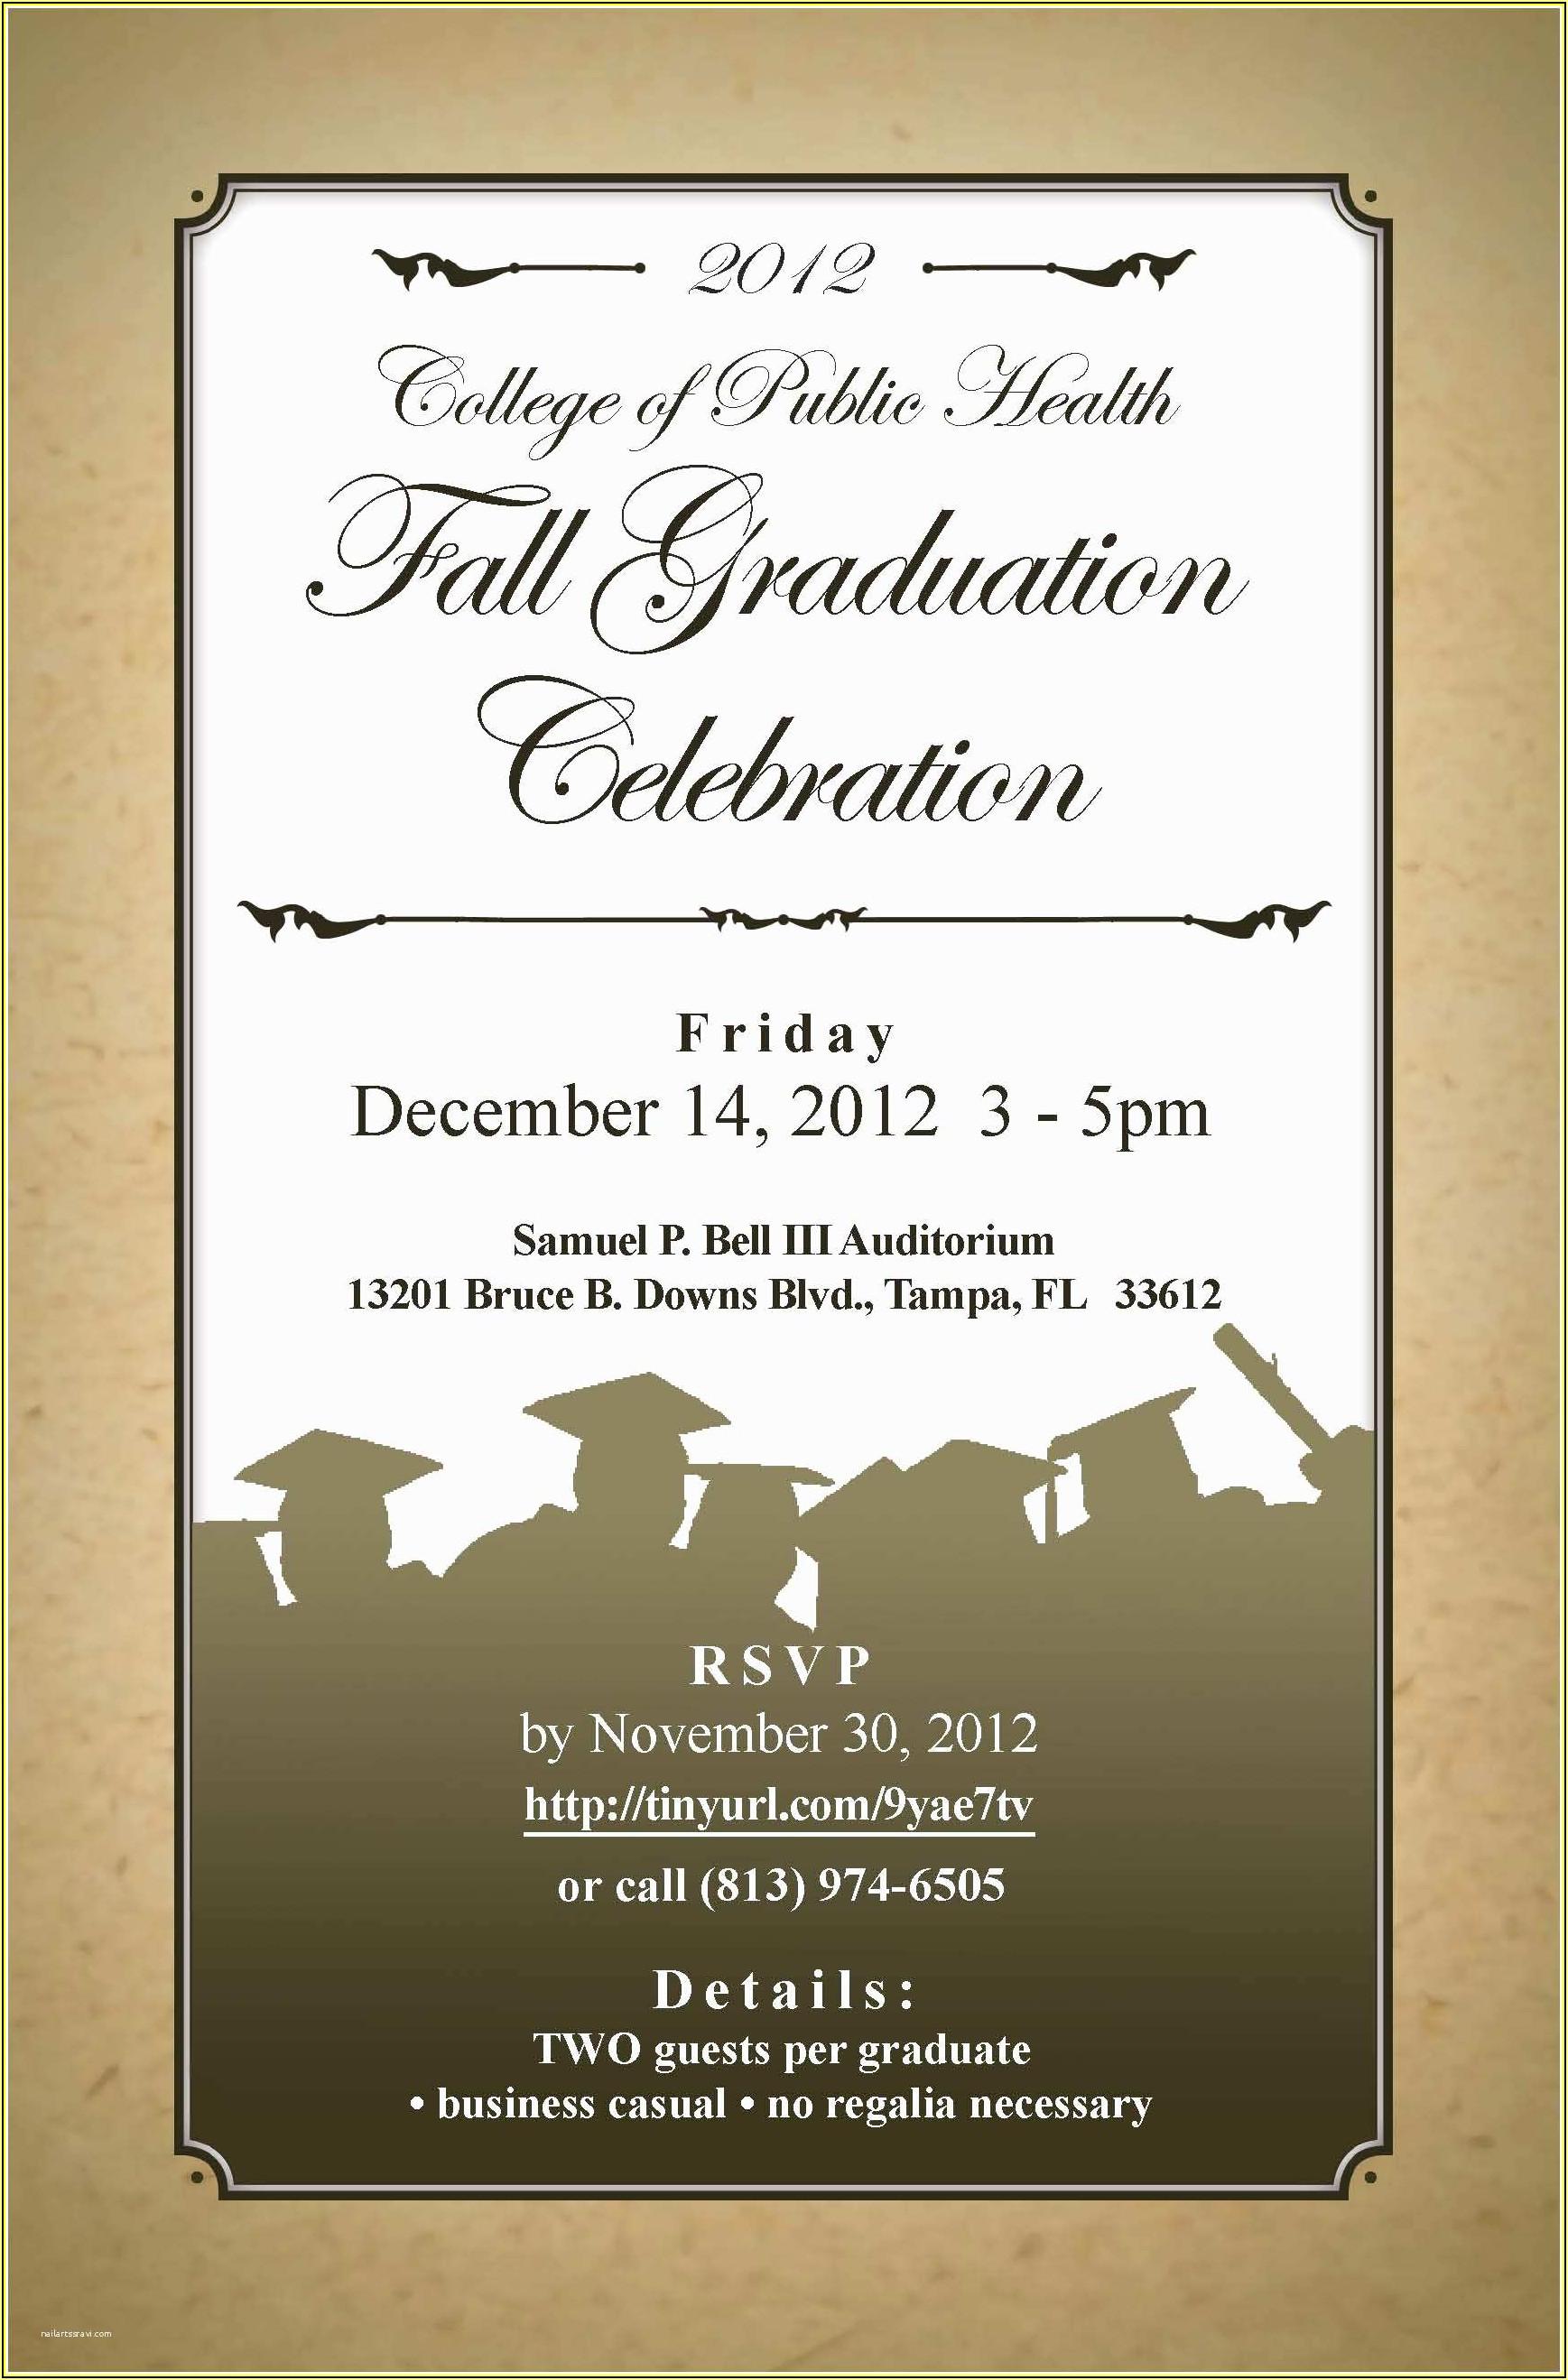 Graduation Invitation Maker Free Download